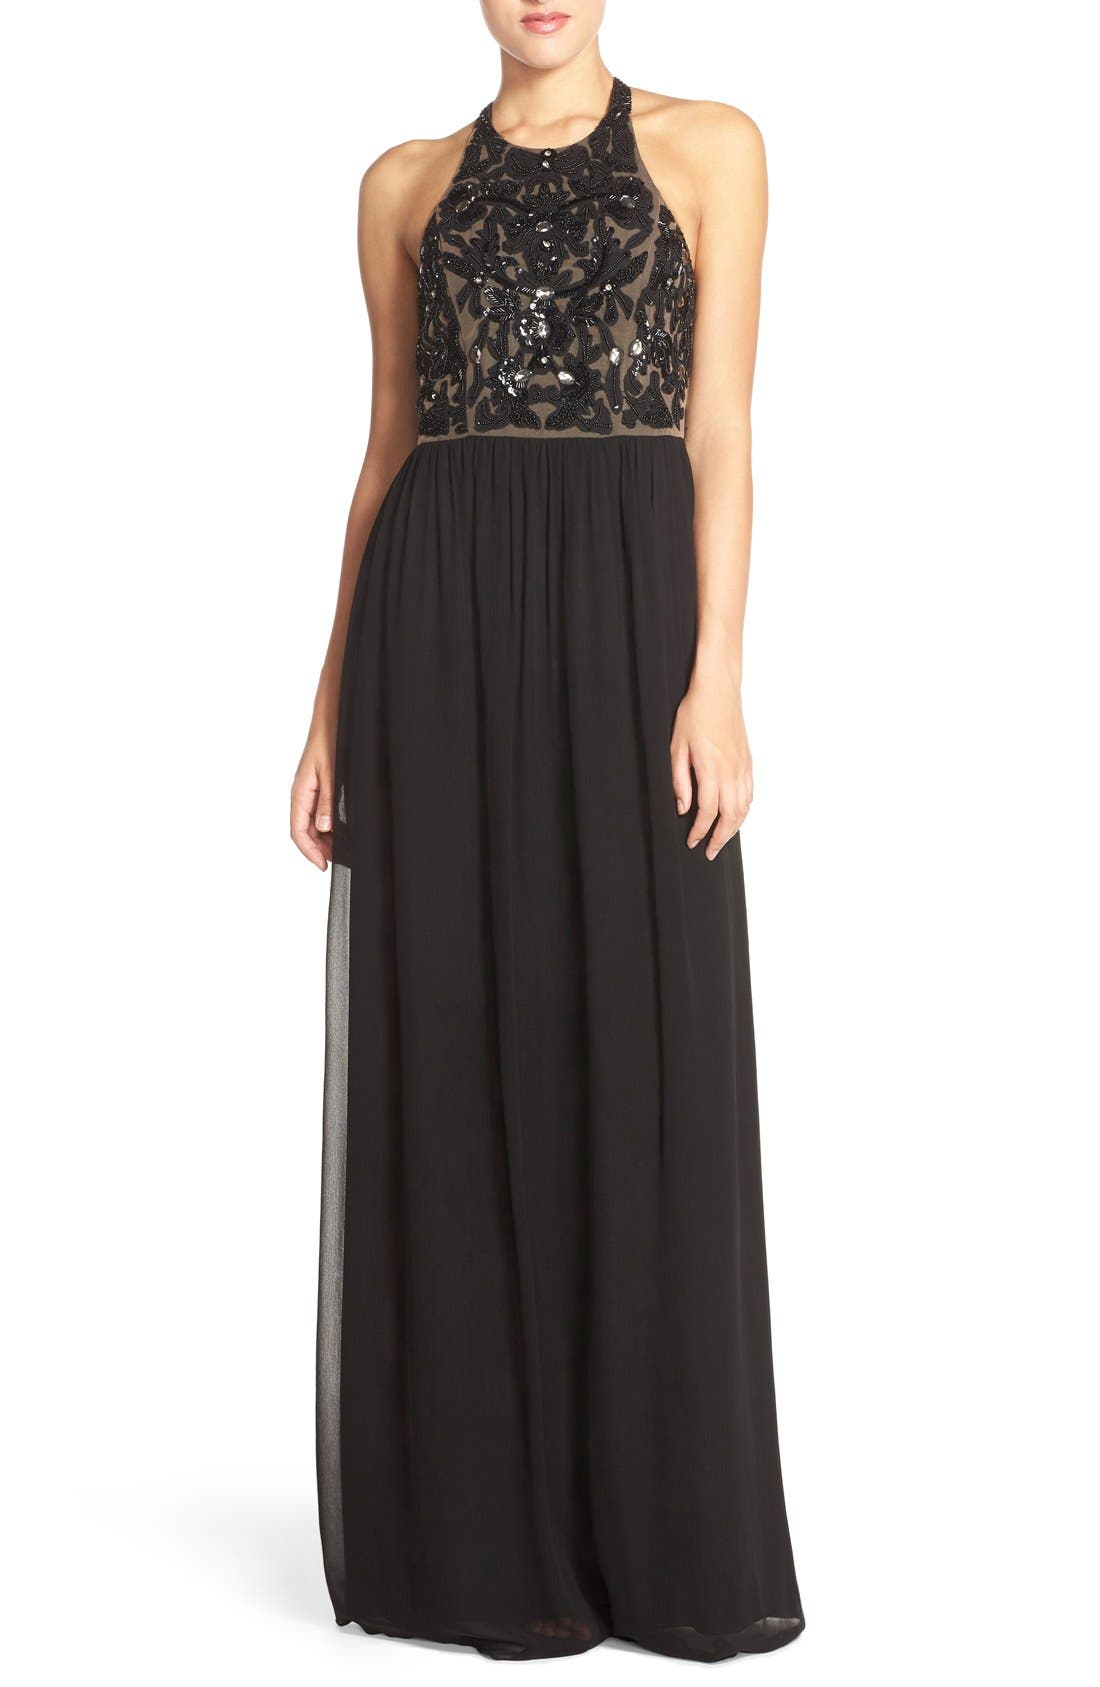 Alternate Image 1 Selected - Parker 'Cassey' Embellished Bodice Halter Style Gown